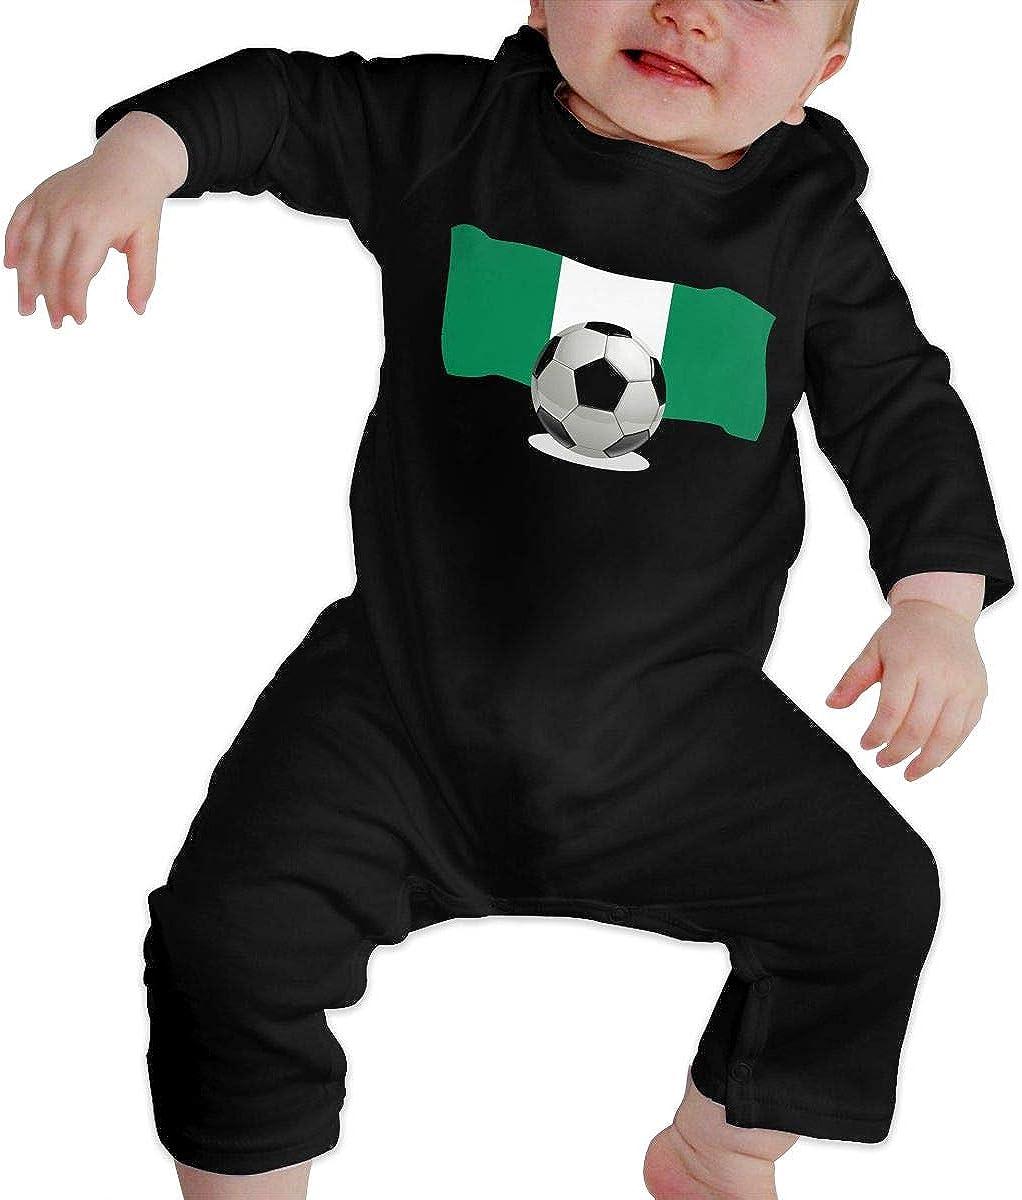 Soccer Ball with Nigeria Flag Newborn Infant Jumpsuit One Piece Kids Pajamas